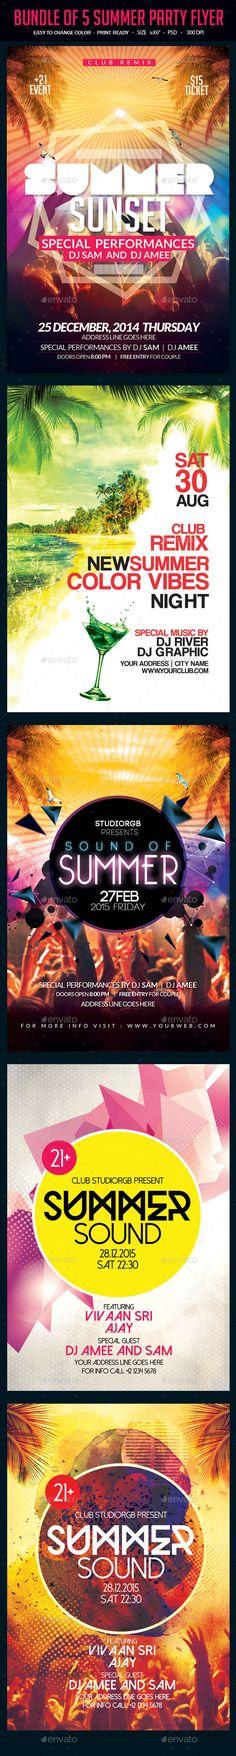 Bundle of 5 Summer Party Flyer Template #design Download: http://graphicriver.net/item/bundle-of-5-summer-party-flyer/12016311?ref=ksioks